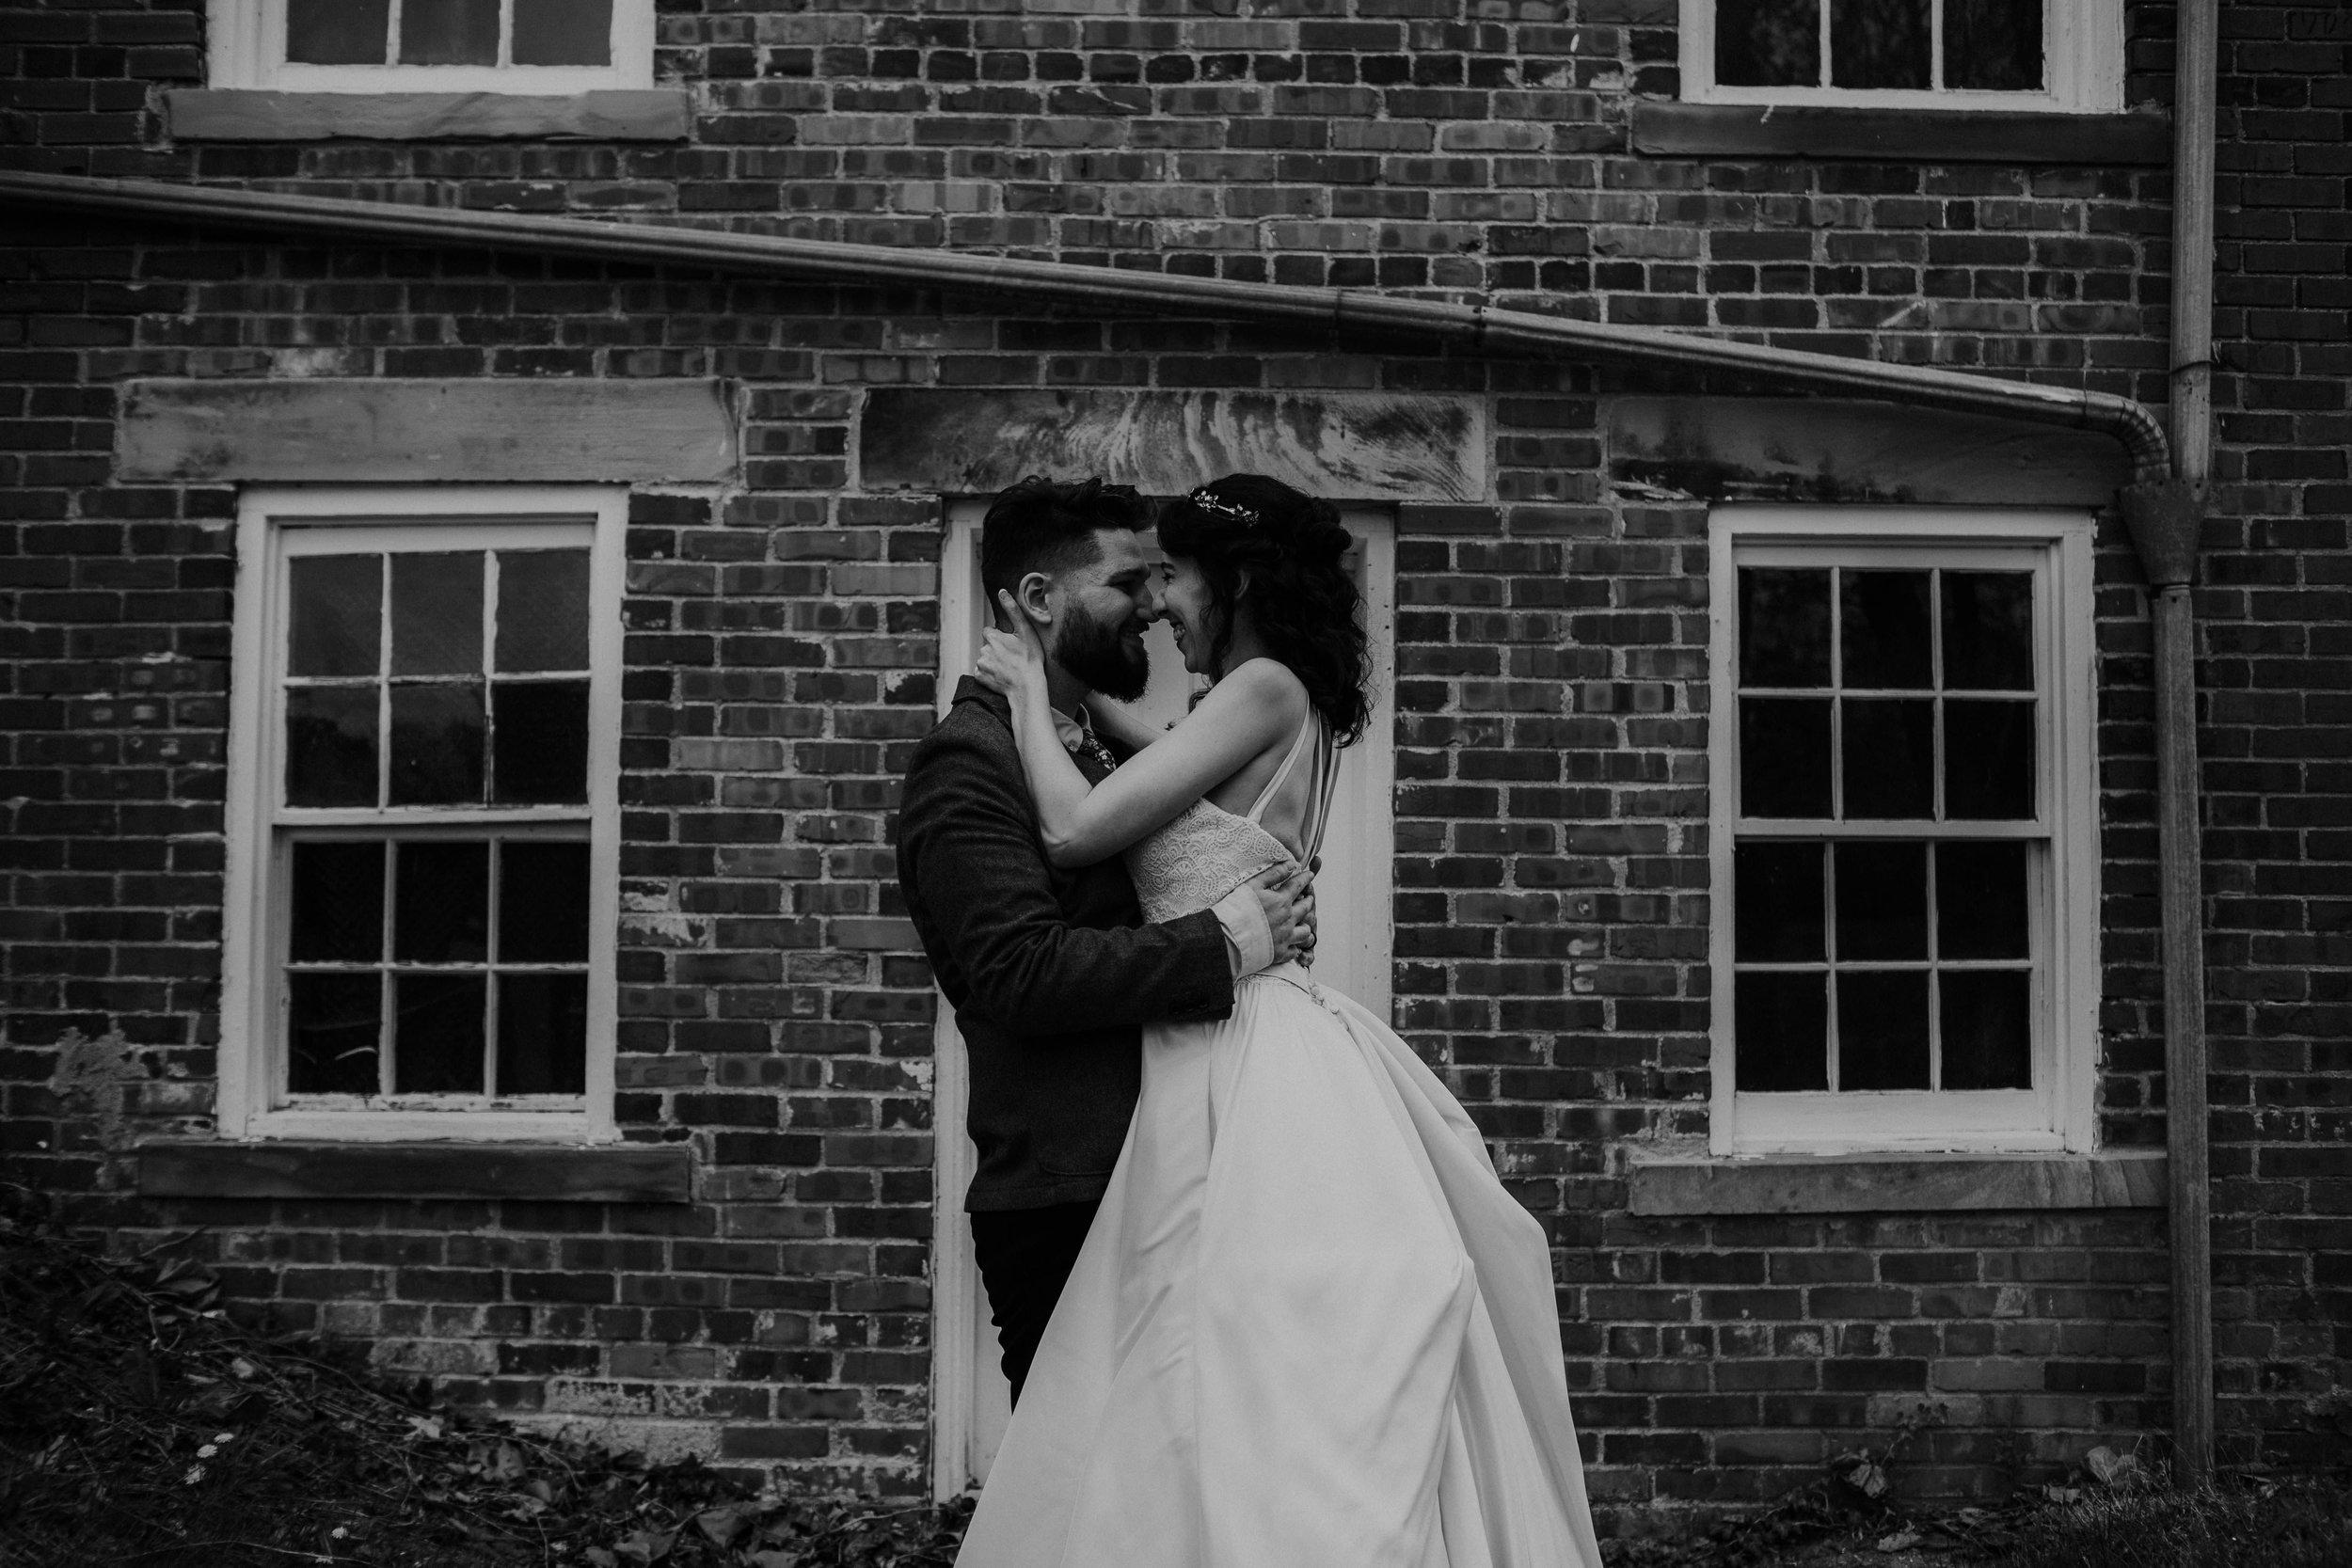 Columbus, Ohio Wedding Photographer Everal Barn At Heritage Park Wedding Venue Grace E Jones Photography170.jpg